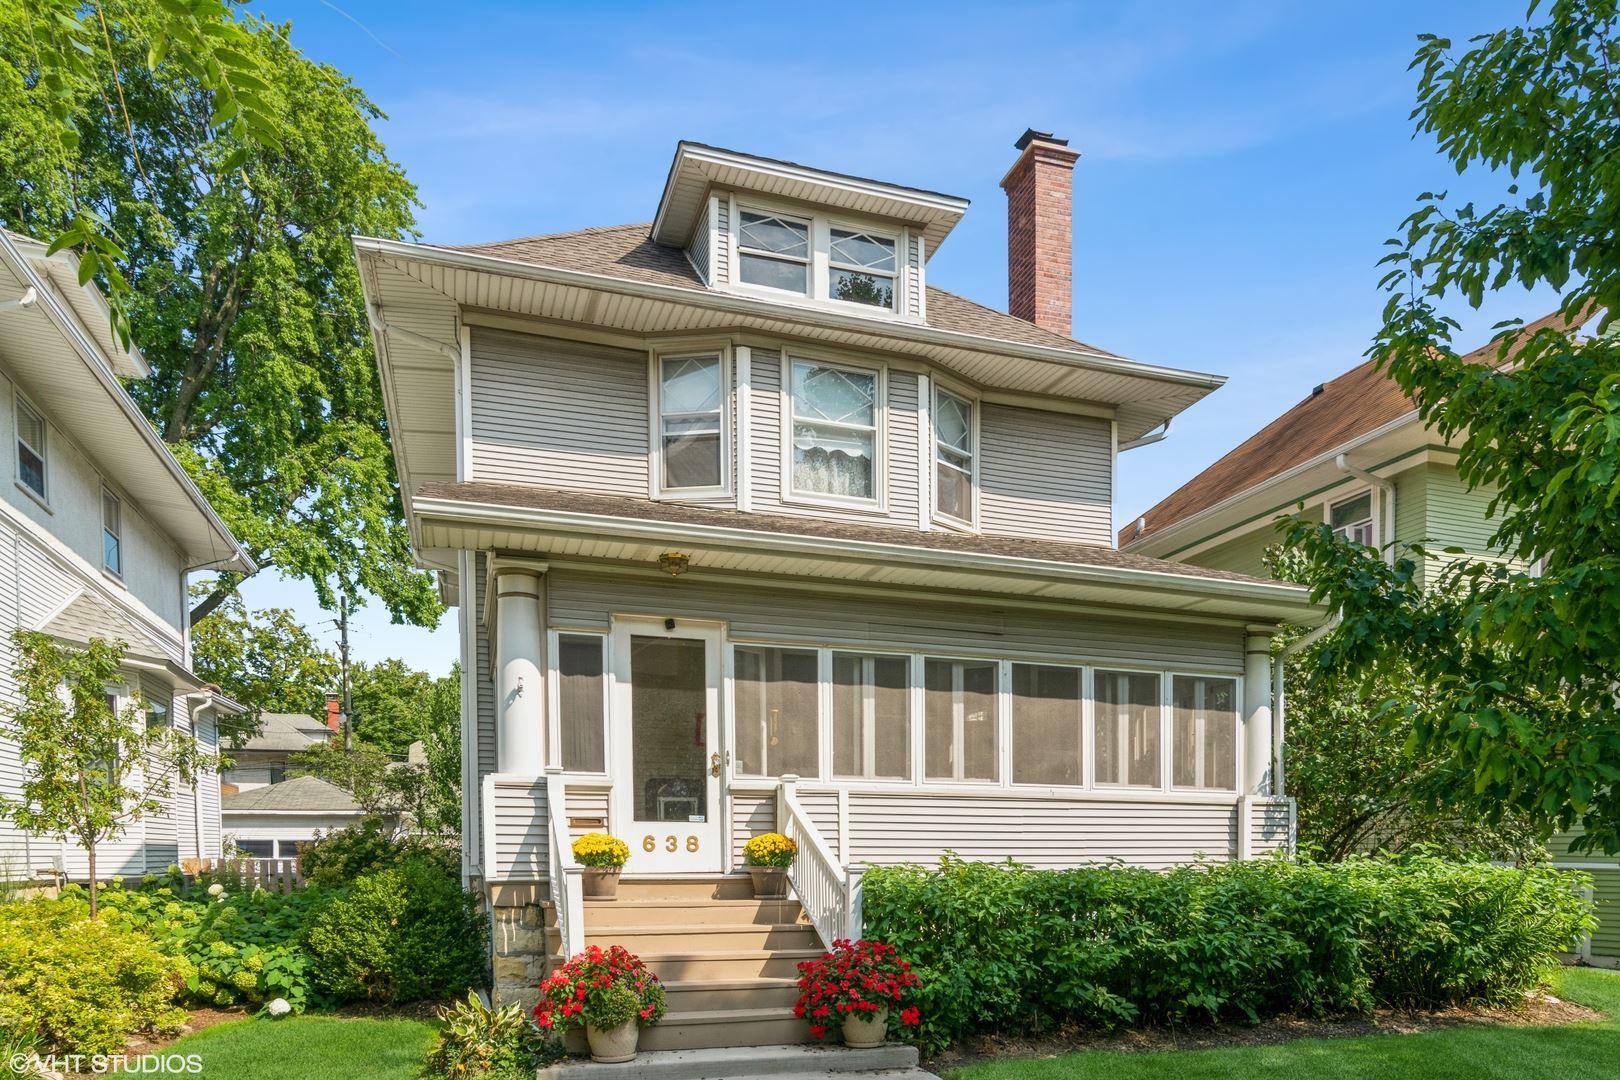 638 Gunderson Avenue, Oak Park, IL 60304 - #: 11220785